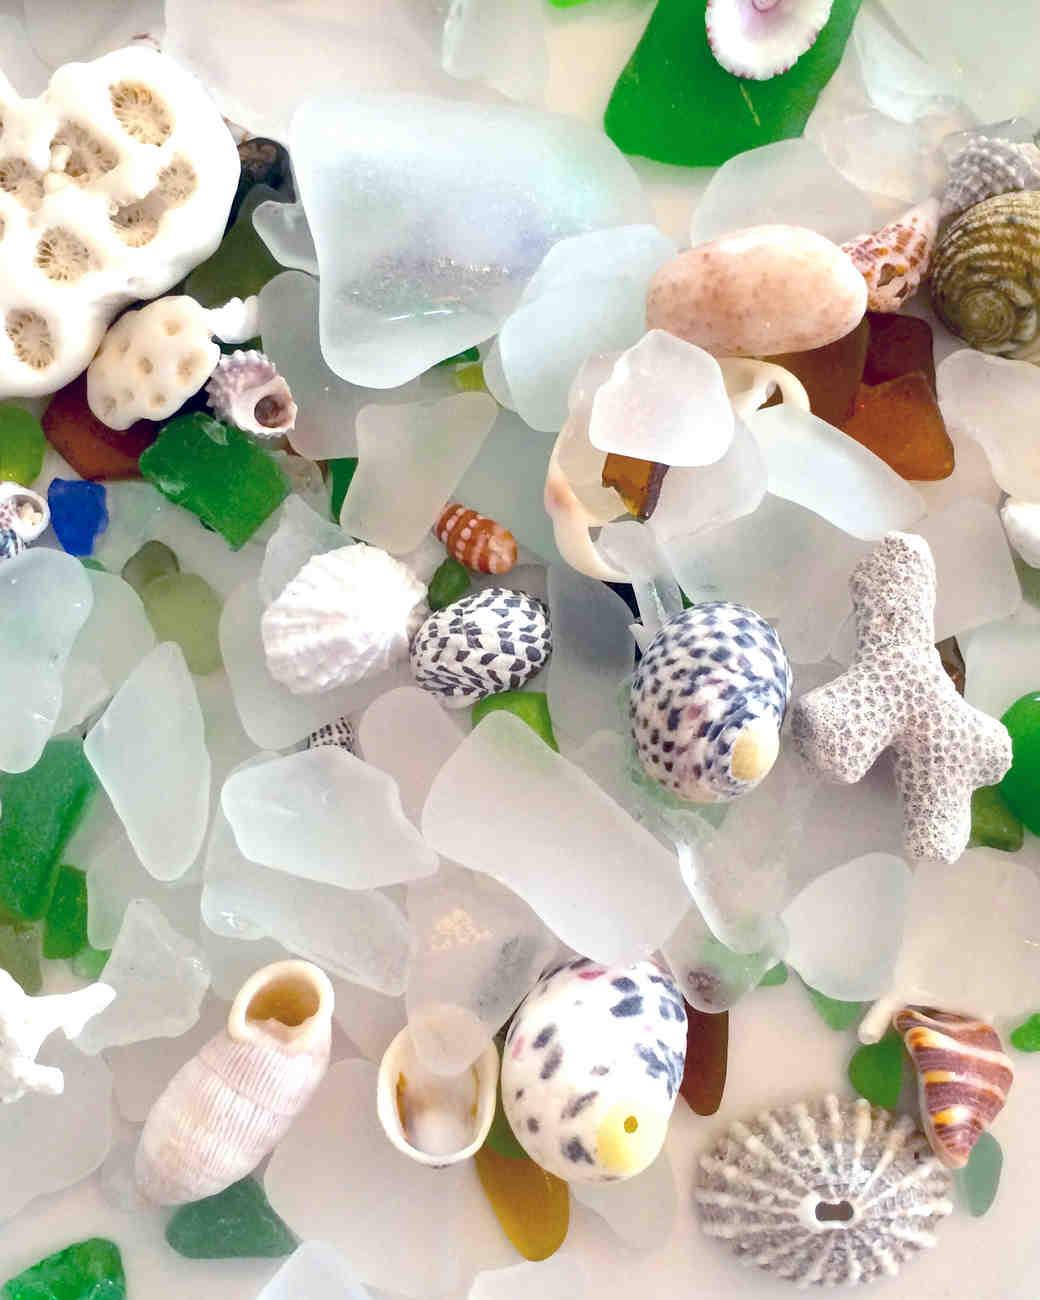 whitney-paul-caribbean-honeymoon-diaries-seashells-seaglass-0215.jpg